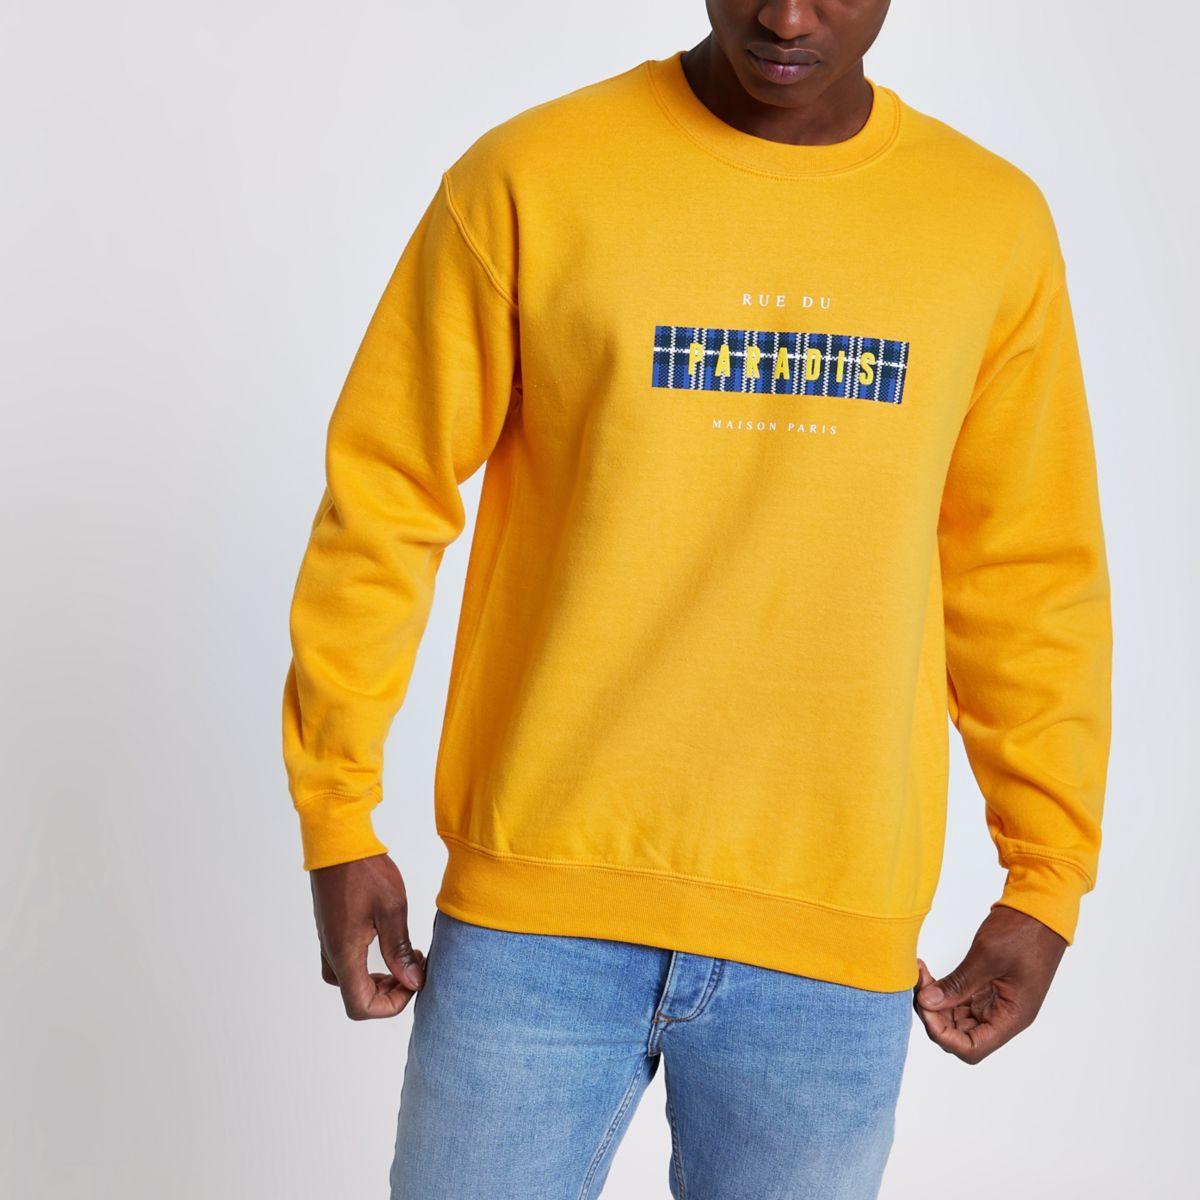 Yellow 'Paradis' long sleeve sweatshirt